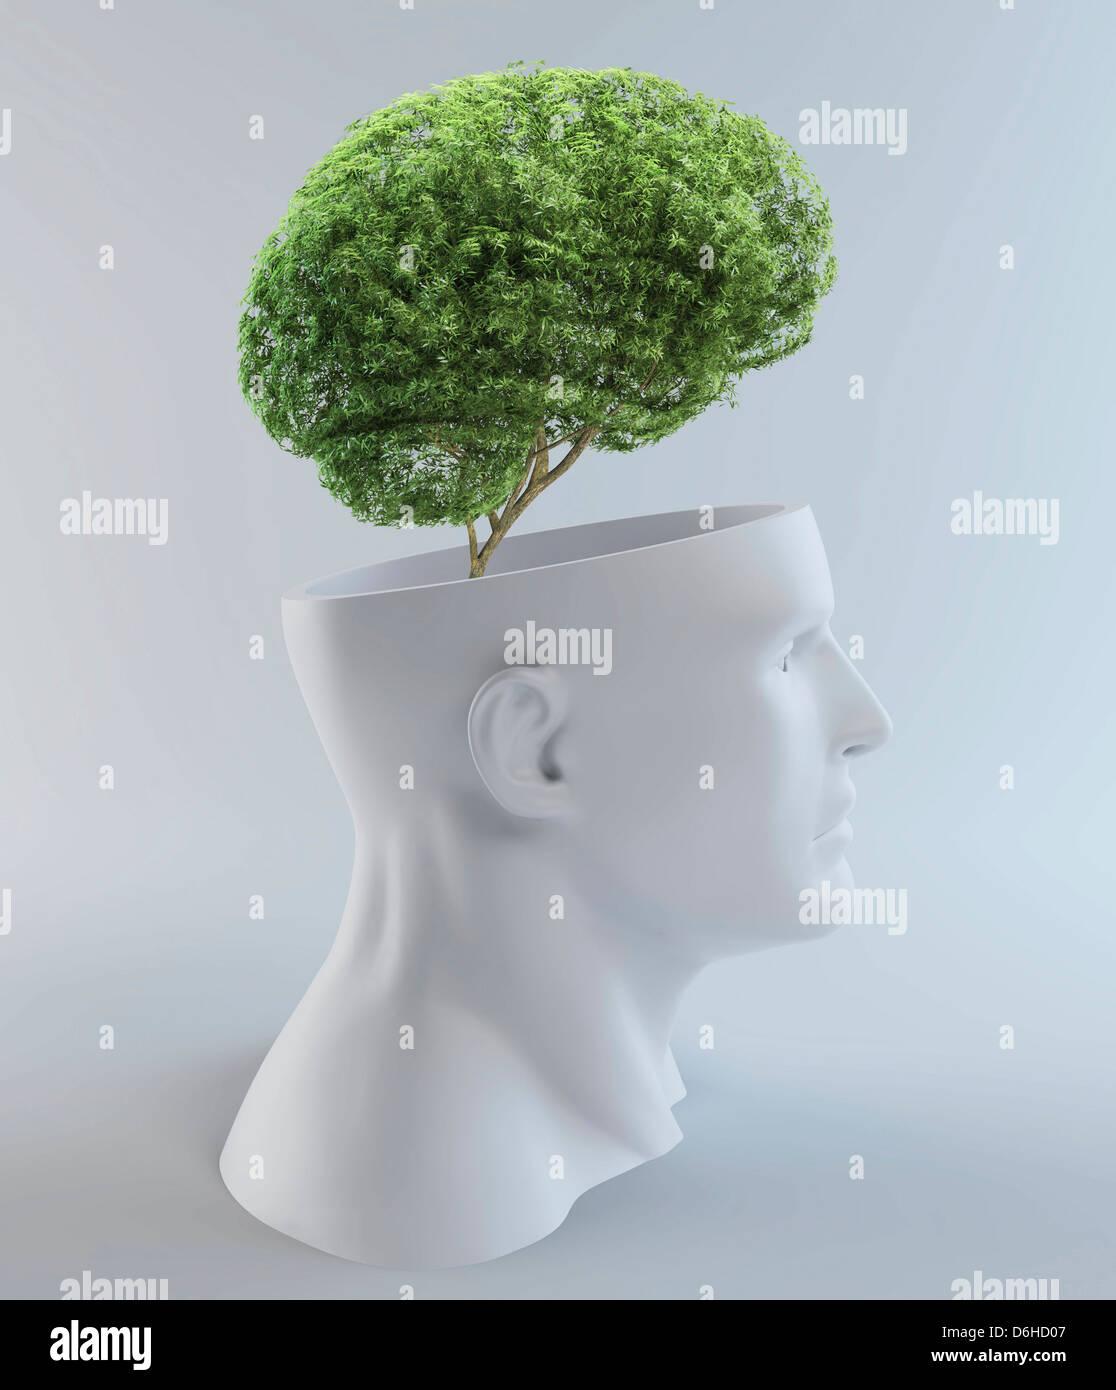 Tree-shaped brain, artwork - Stock Image